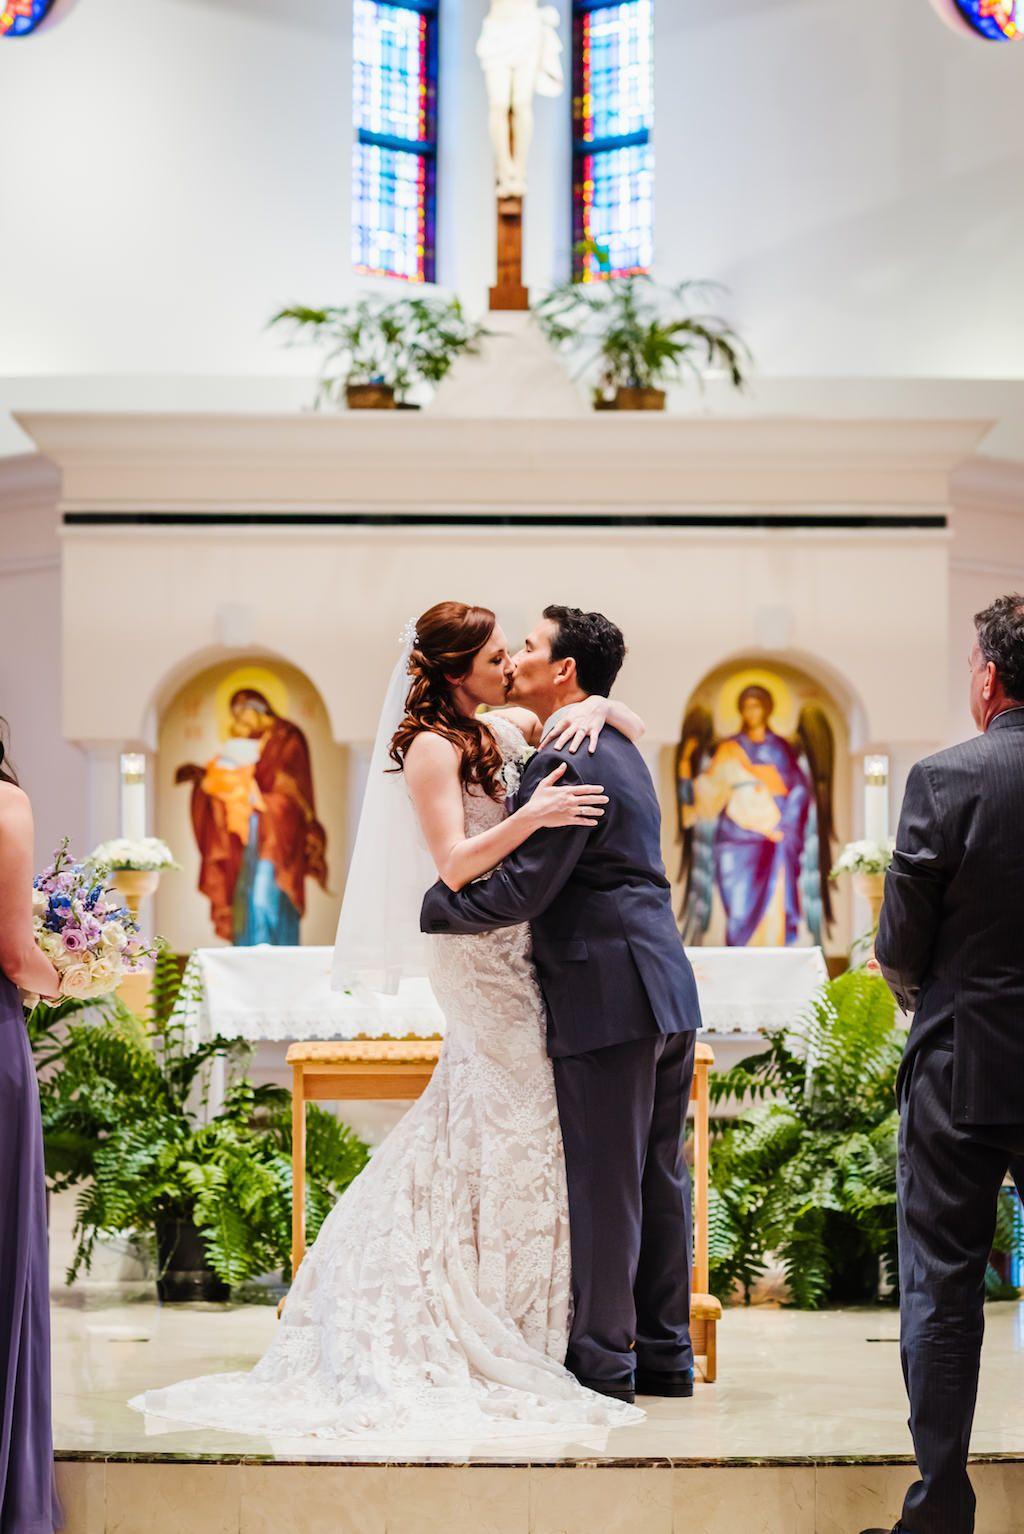 Traditional Church Ceremony First Kiss Wedding Portrait | St Pete Ceremony Venue St. Raphael's Catholic Church